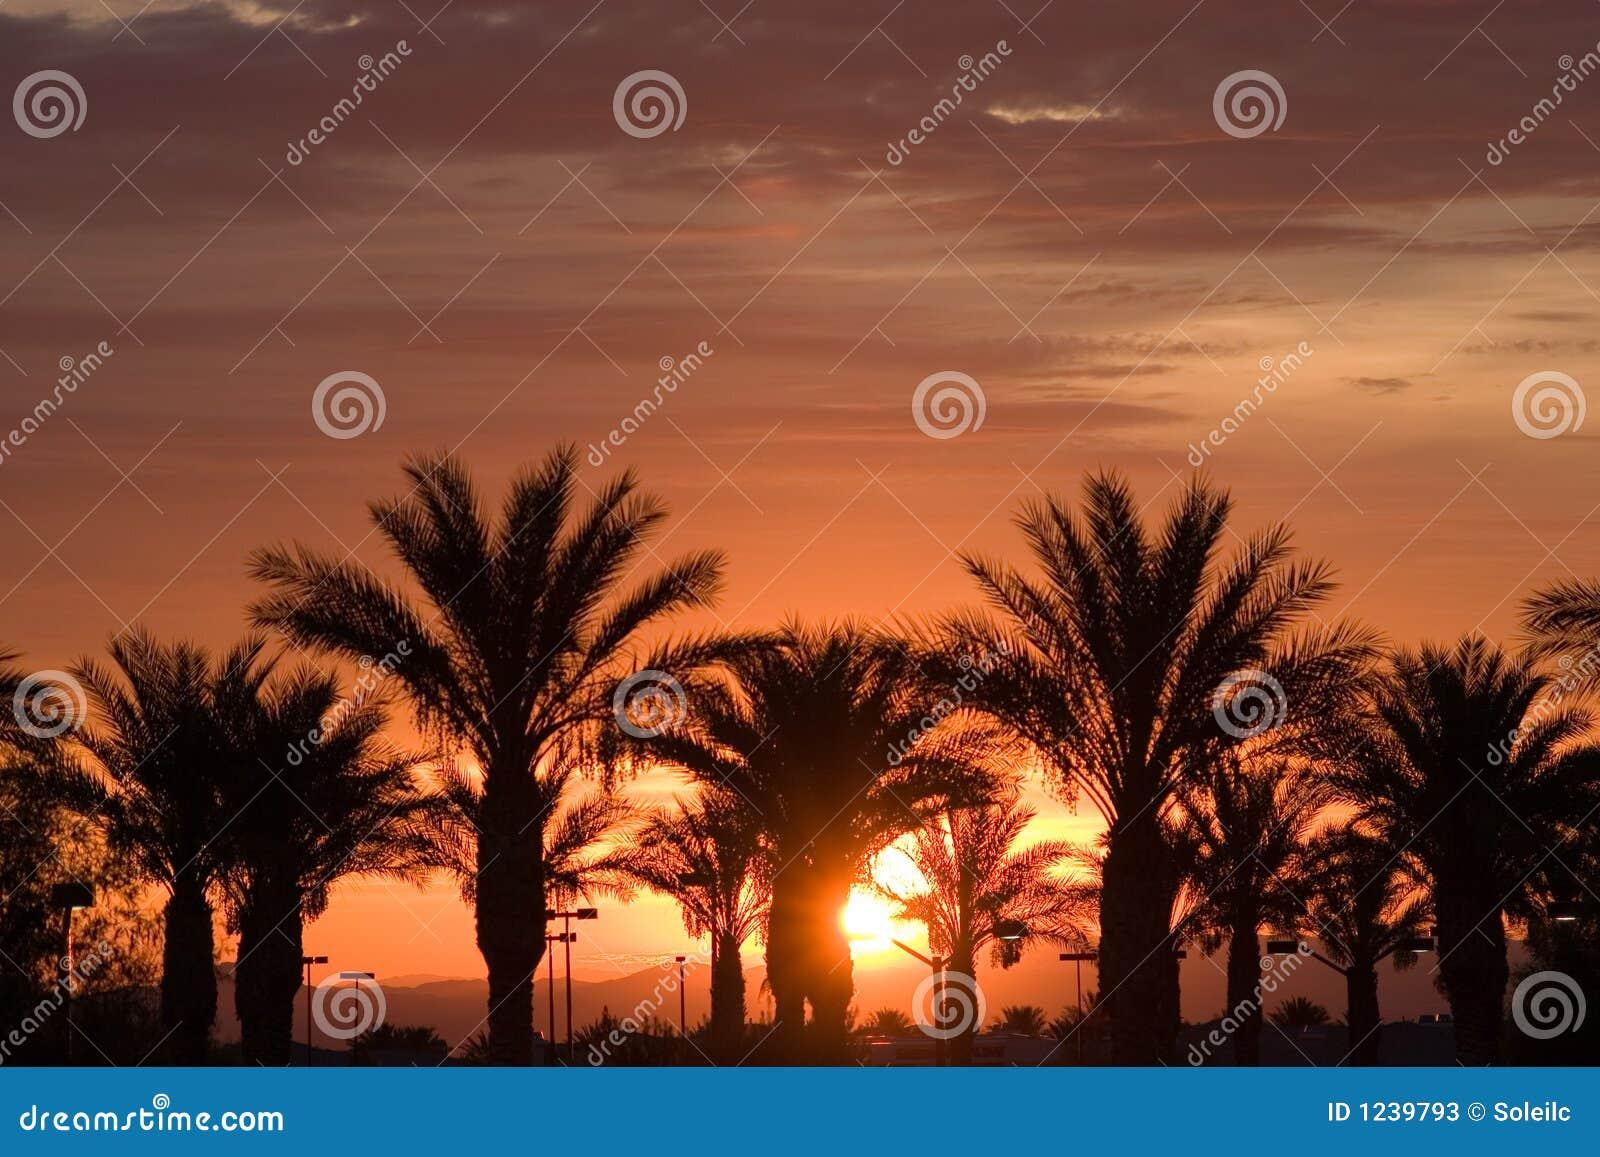 palm trees during las vegas sunrise stock image image 1239793. Black Bedroom Furniture Sets. Home Design Ideas